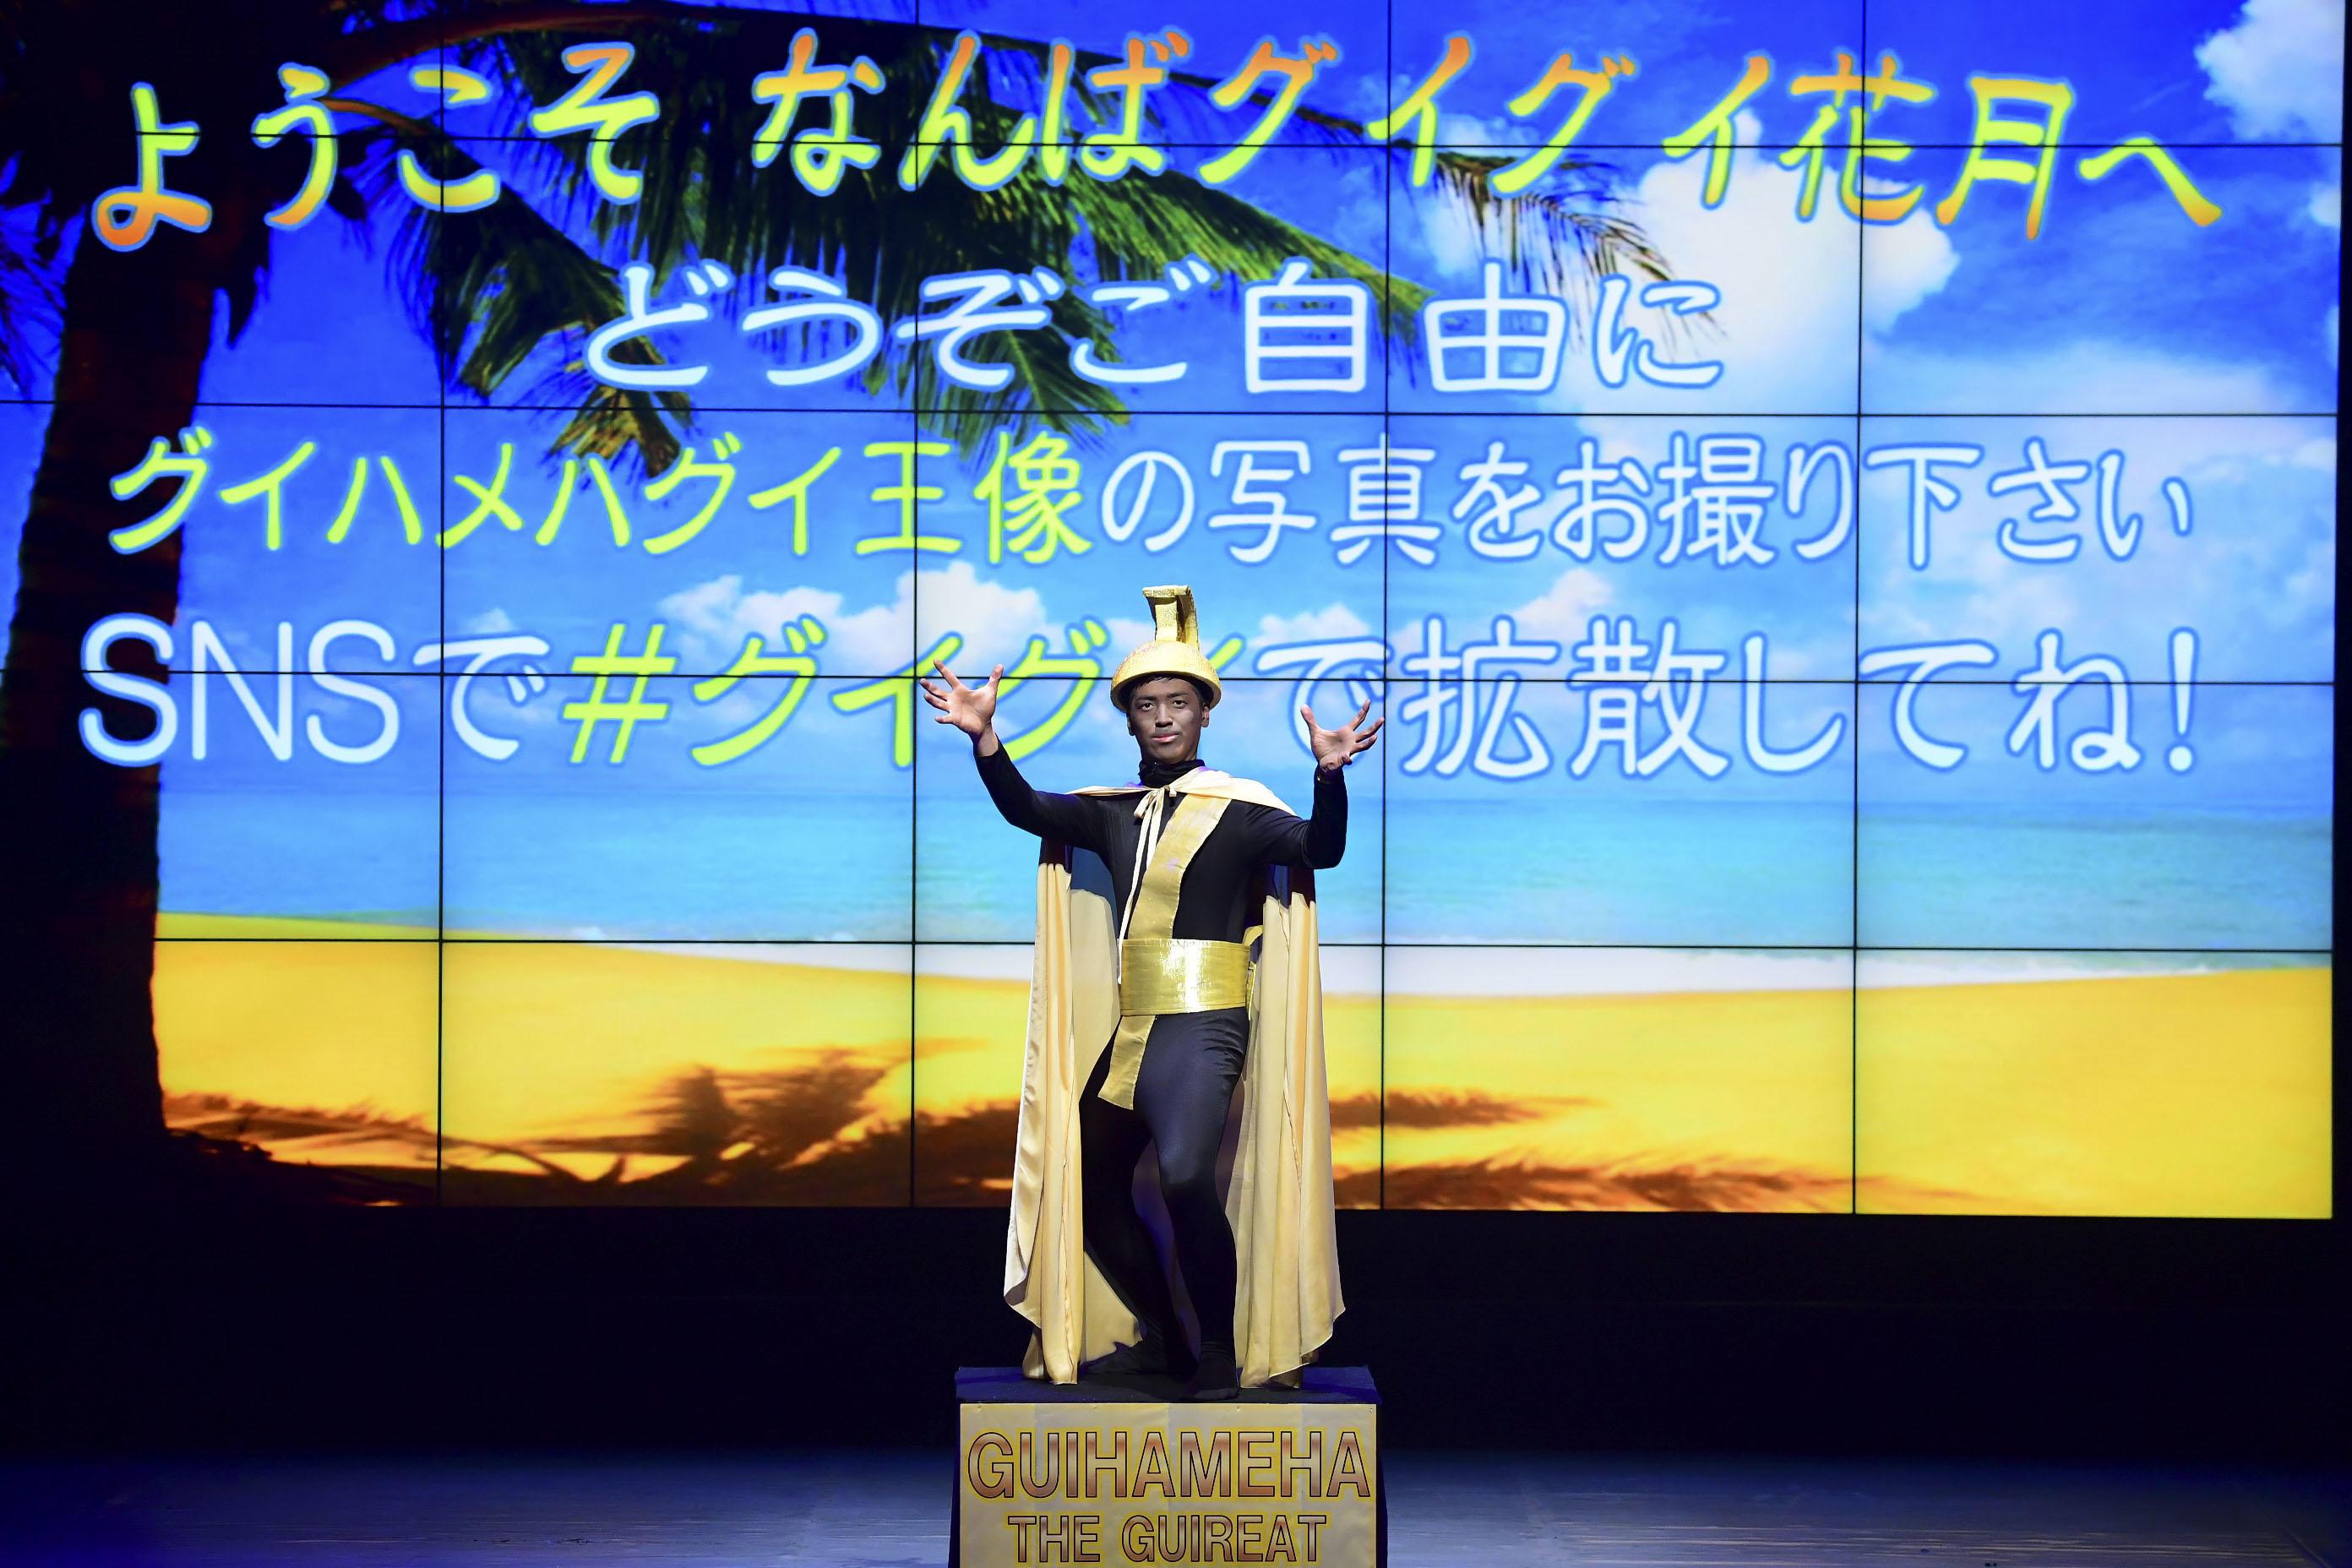 http://news.yoshimoto.co.jp/20170909190334-b39987b63ee400ff19508e0687932b963e55c287.jpg